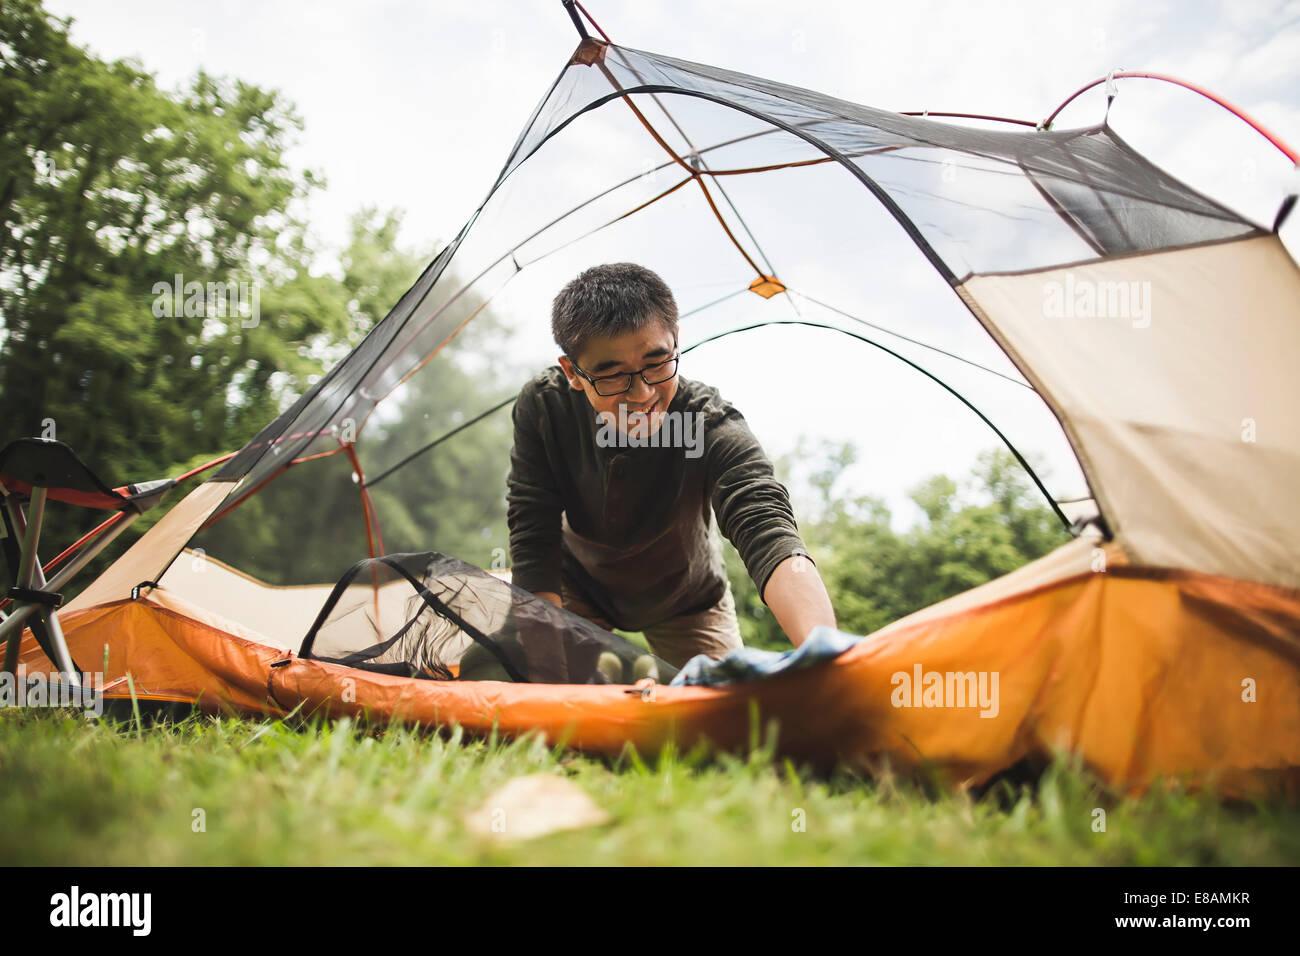 Mature man camping - Stock Image